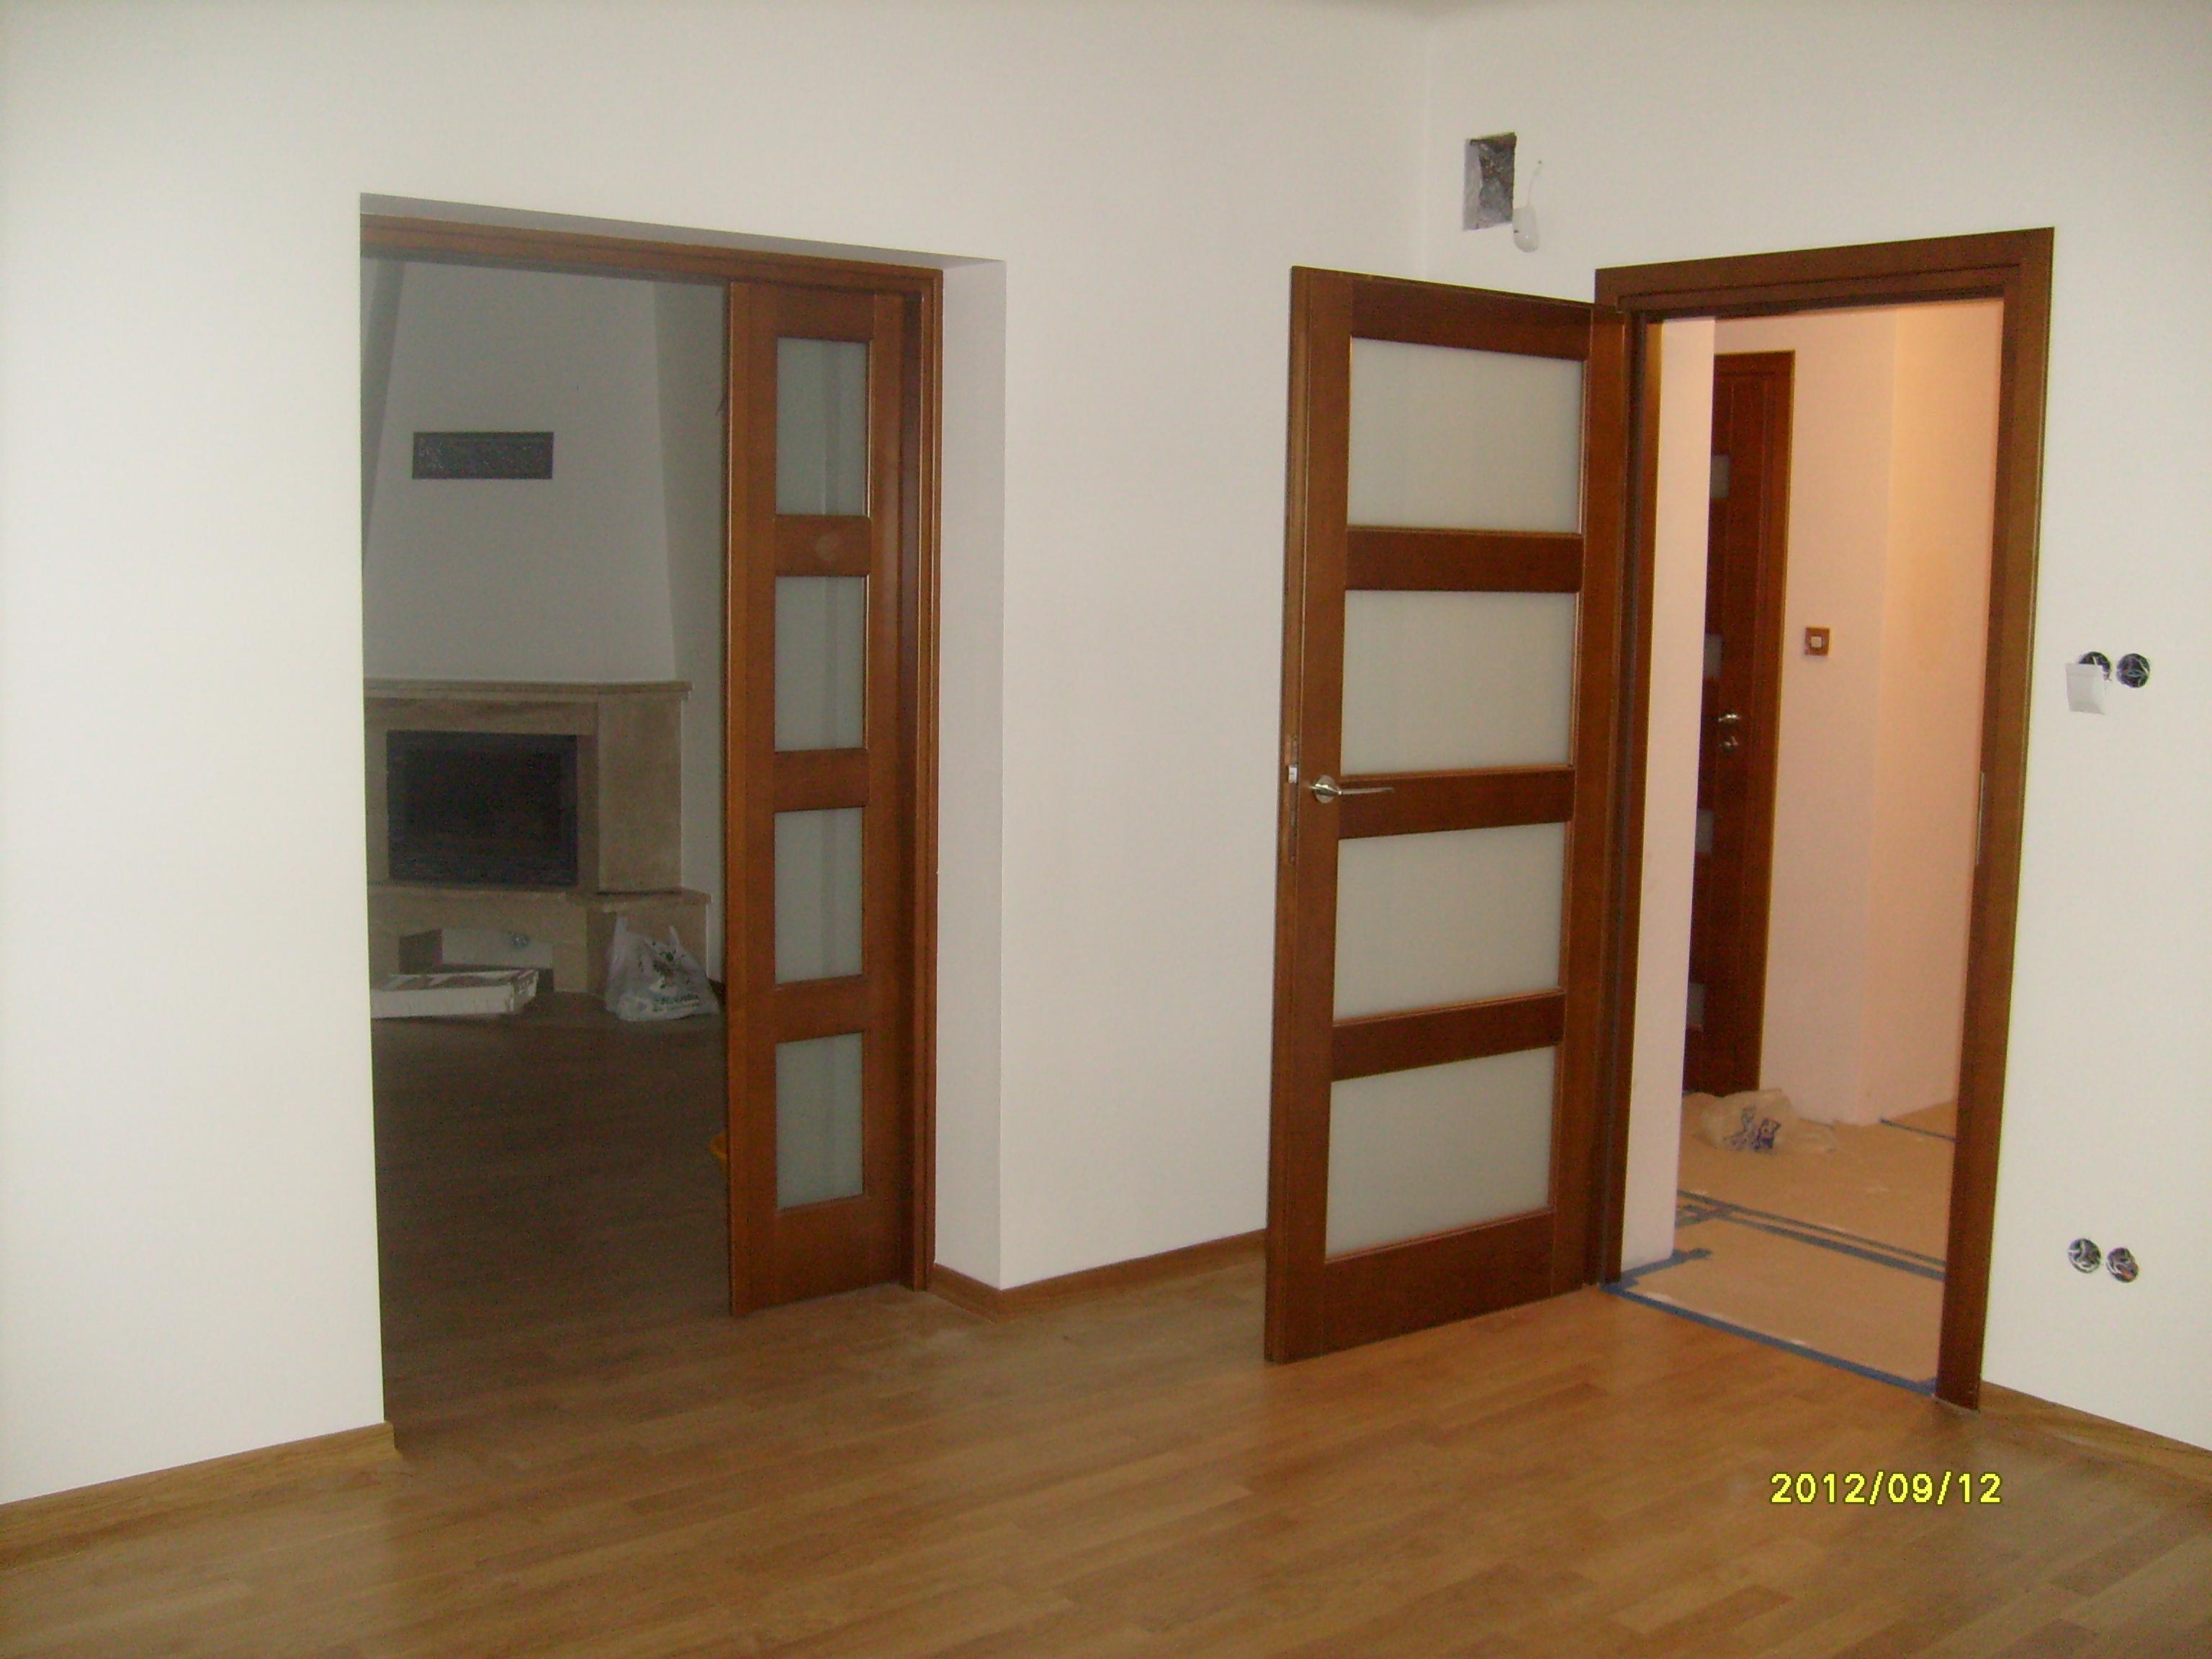 Mieszkanie 1 (11)